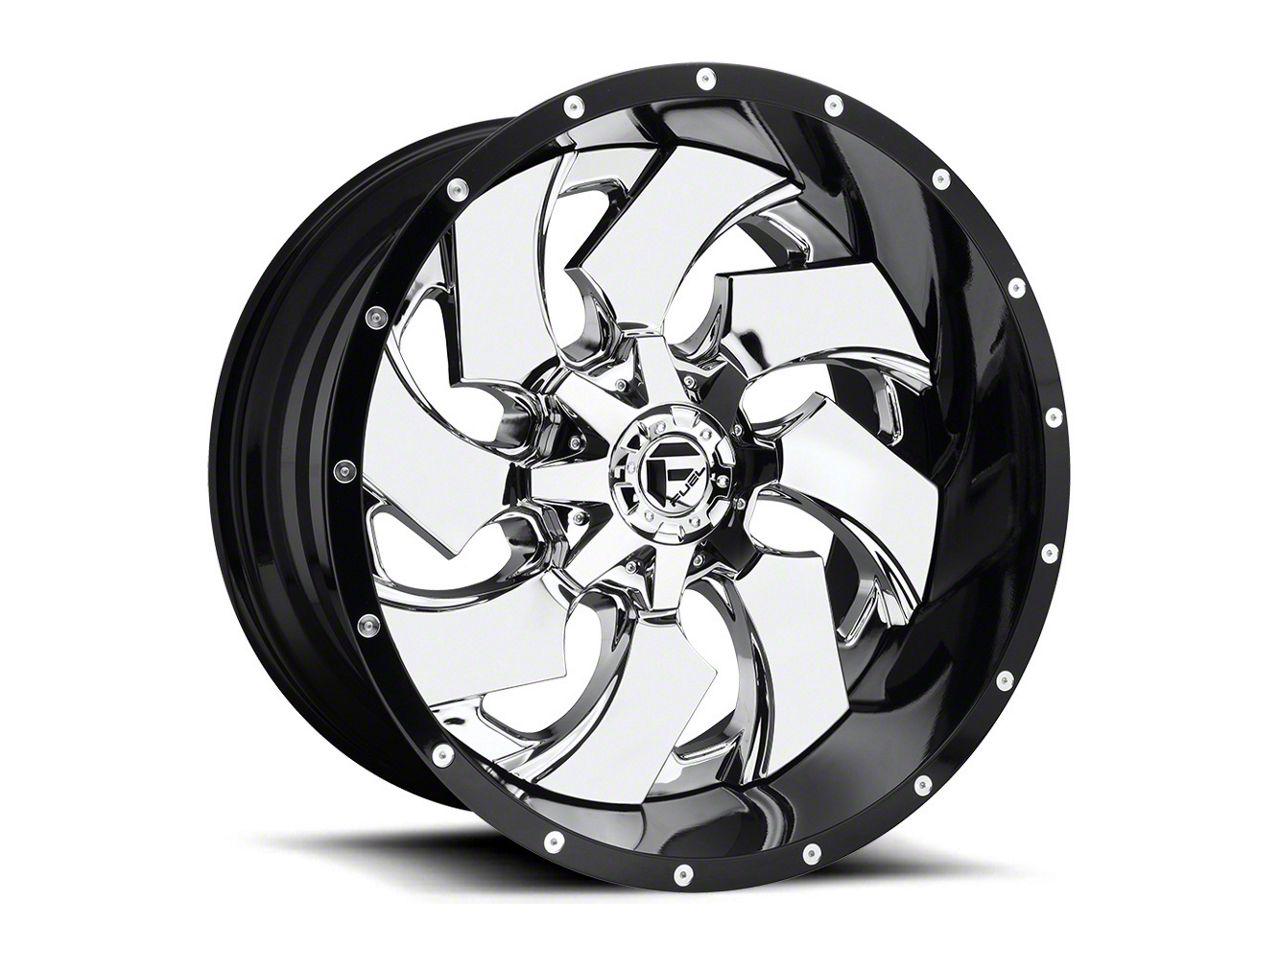 Fuel Wheels Cleaver Chrome 6-Lug Wheel - 24x14 (07-18 Sierra 1500)